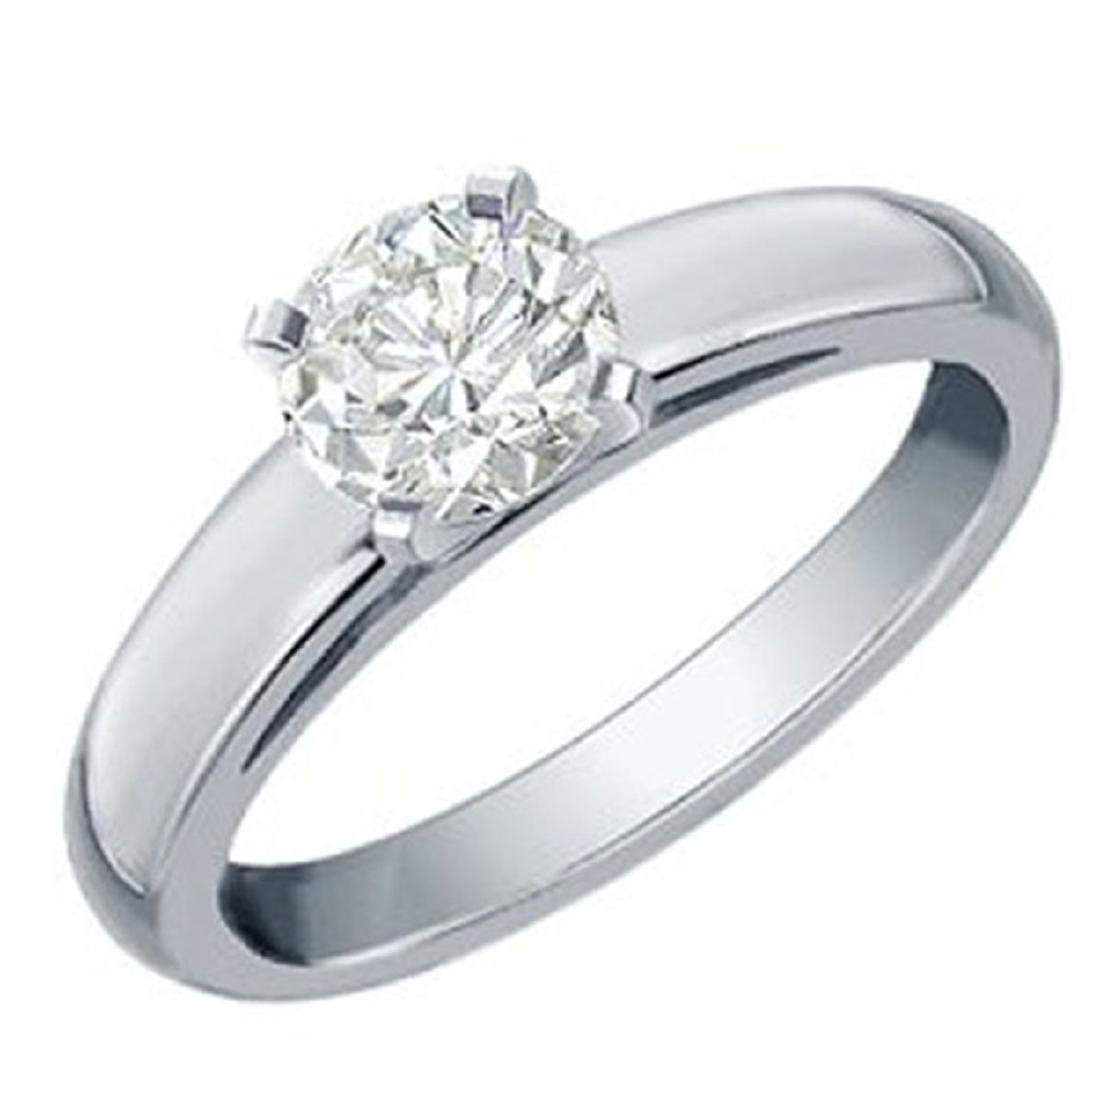 1.75 ctw VS/SI Diamond Solitaire Ring 18K White Gold -